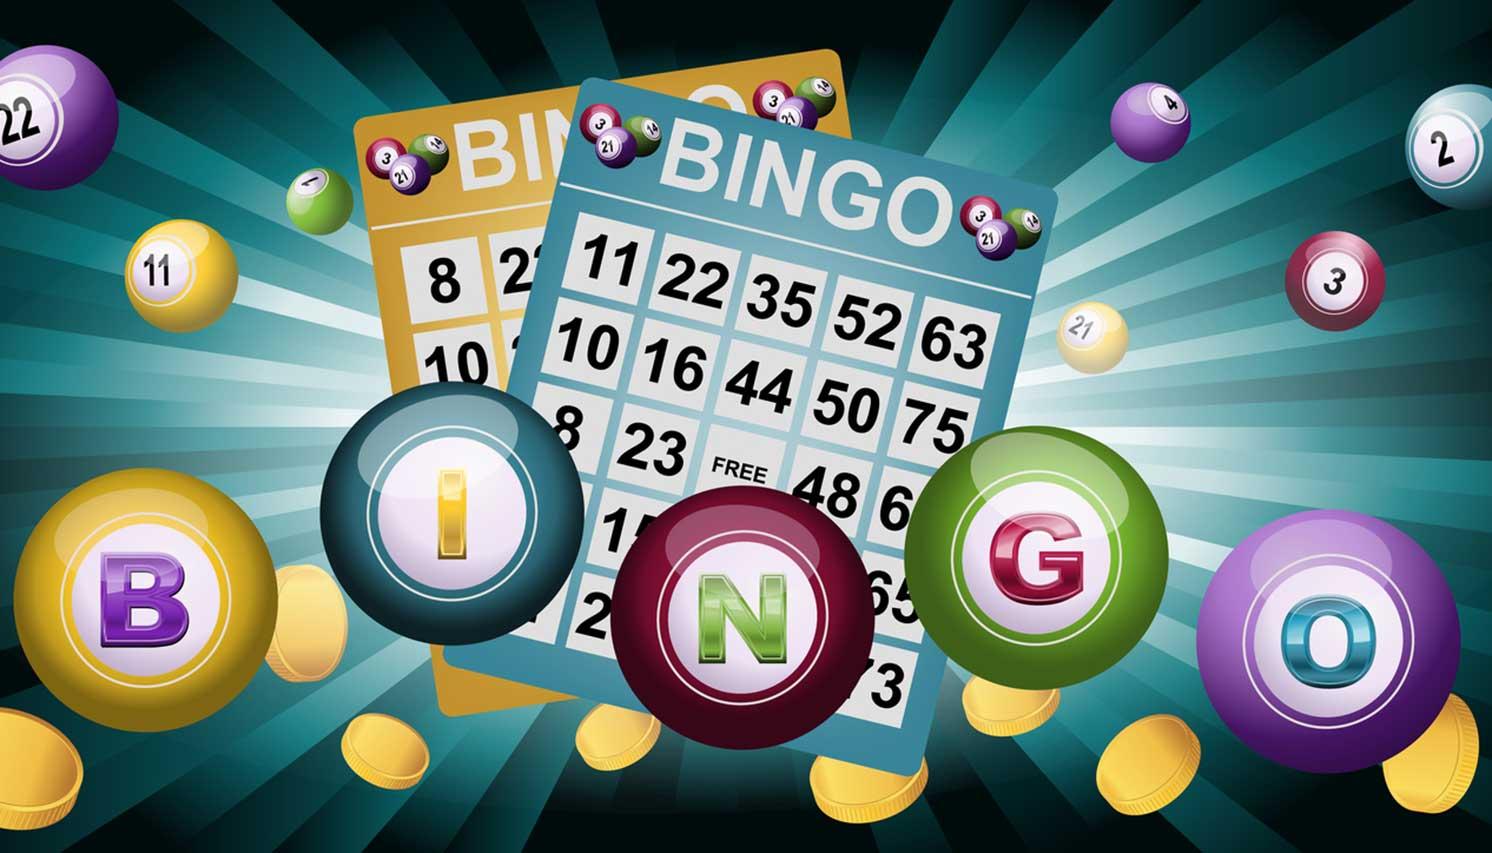 Play Bingo Online for Free!